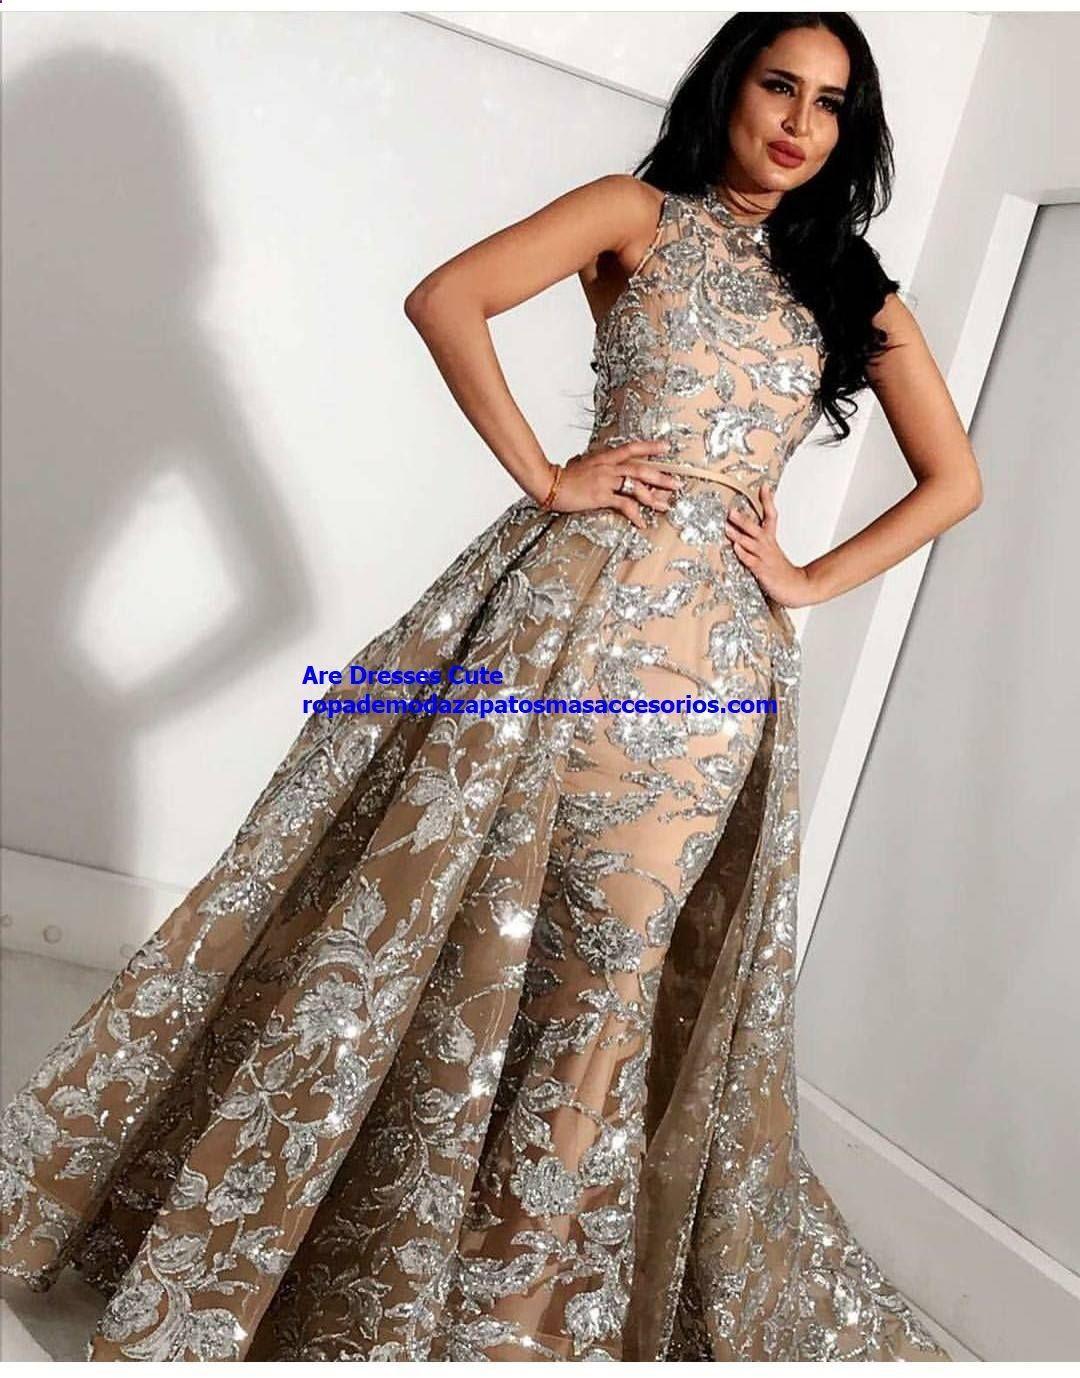 Dresses fashion dresses at dillards dresses at kohls dresses at